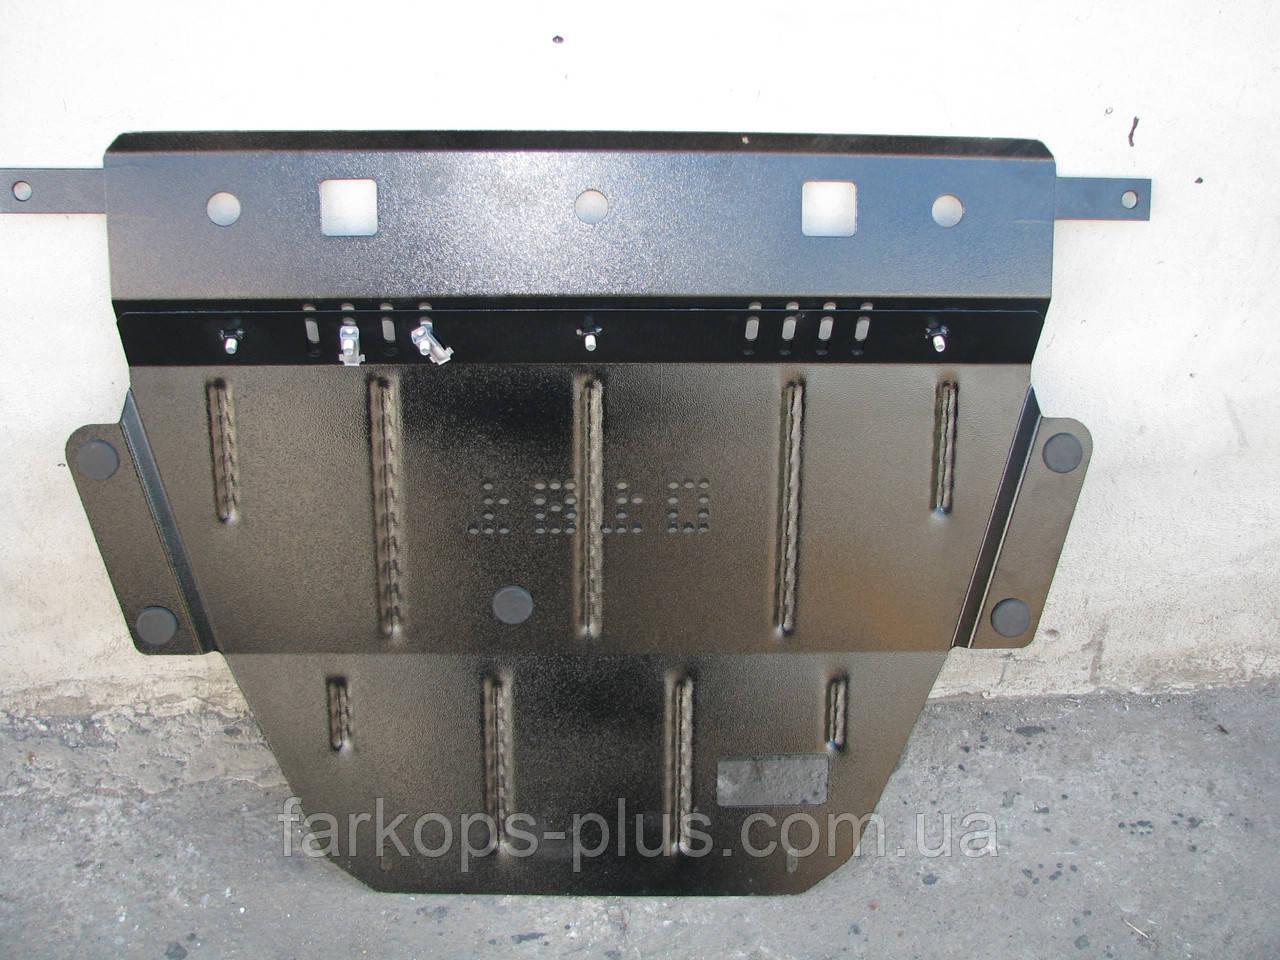 Захист двигуна і кпп - Citroen C-4 Picasso (2006--) все